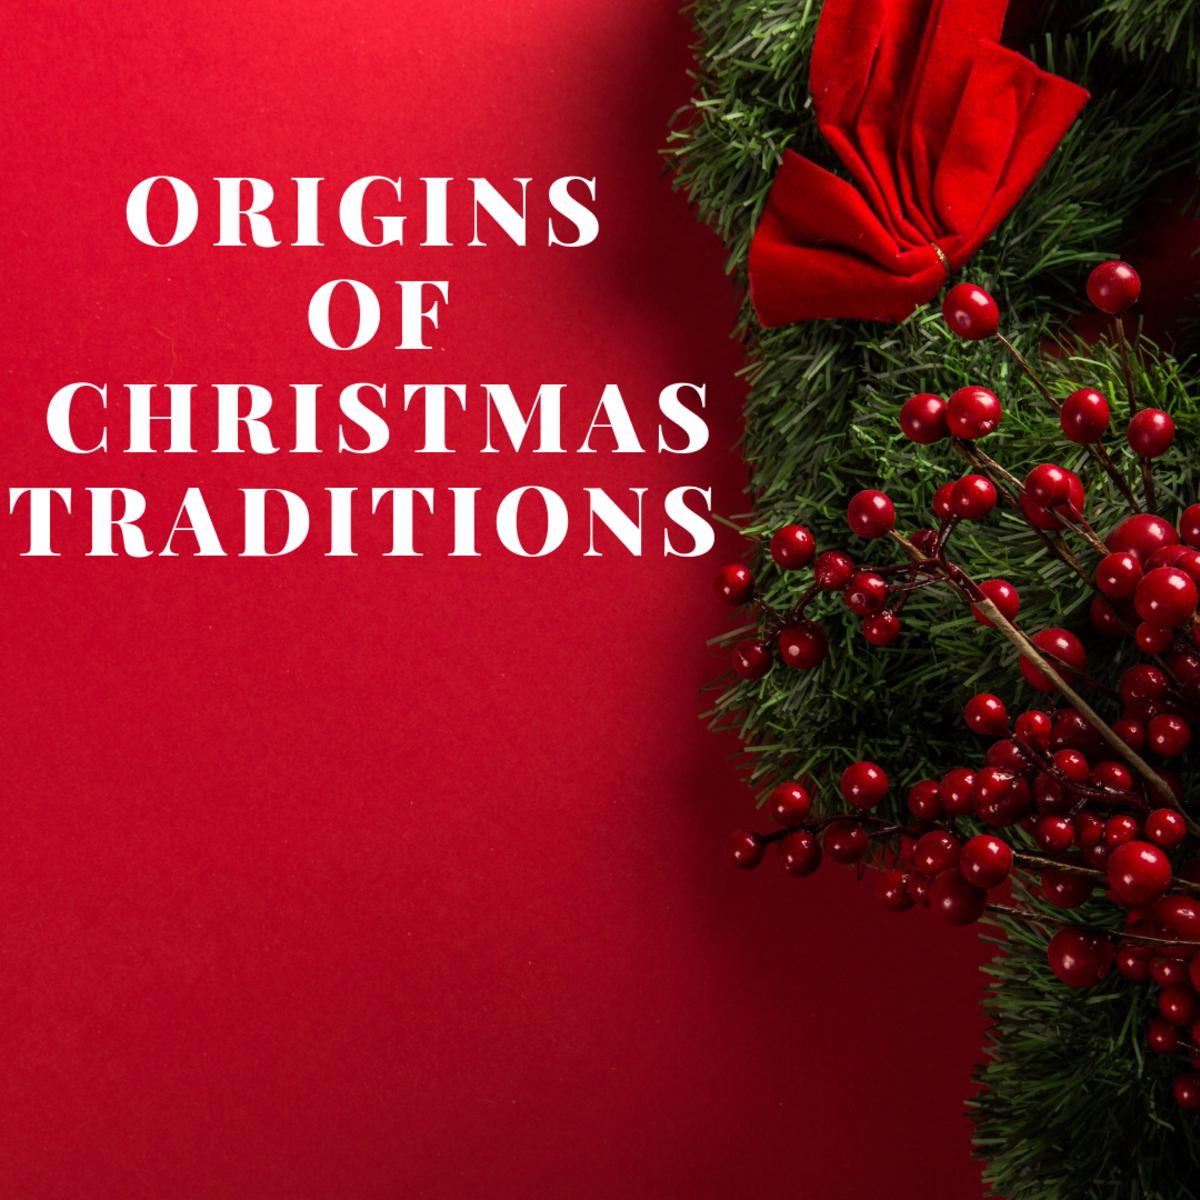 Origins of Christmas and the Christmas Traditions We Enjoy Today